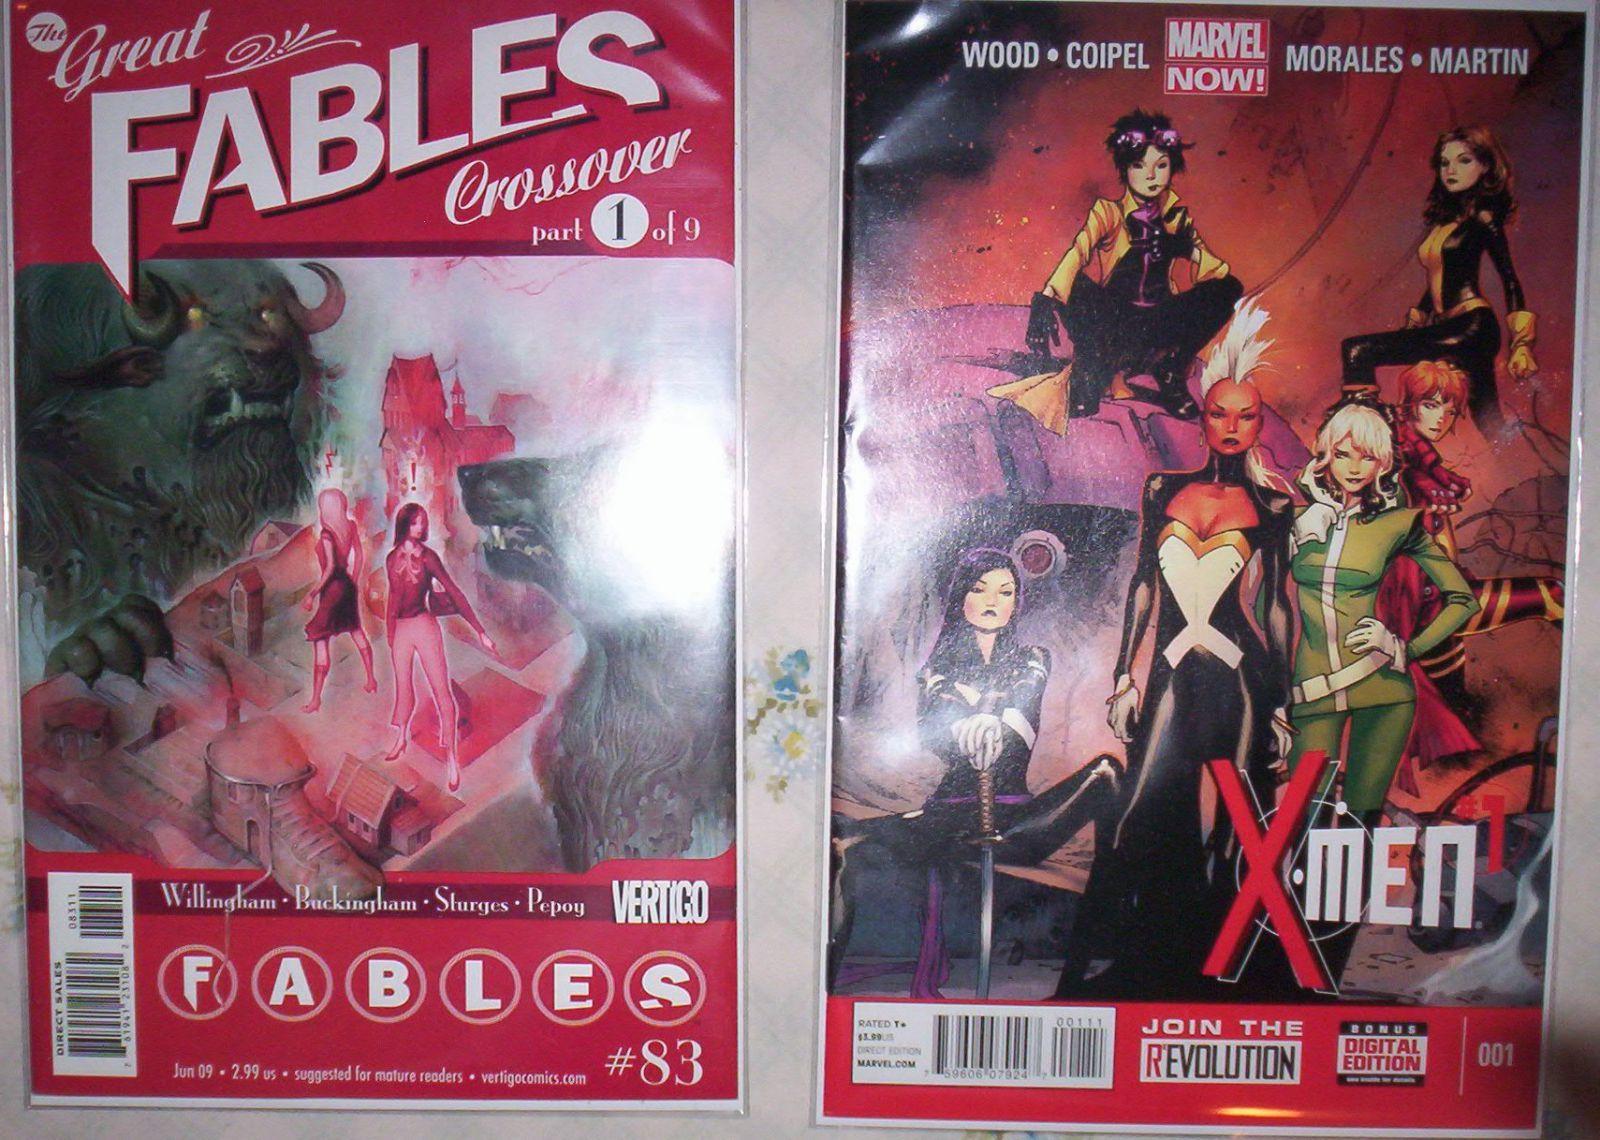 BOTH comics for $1 at Half Price Books